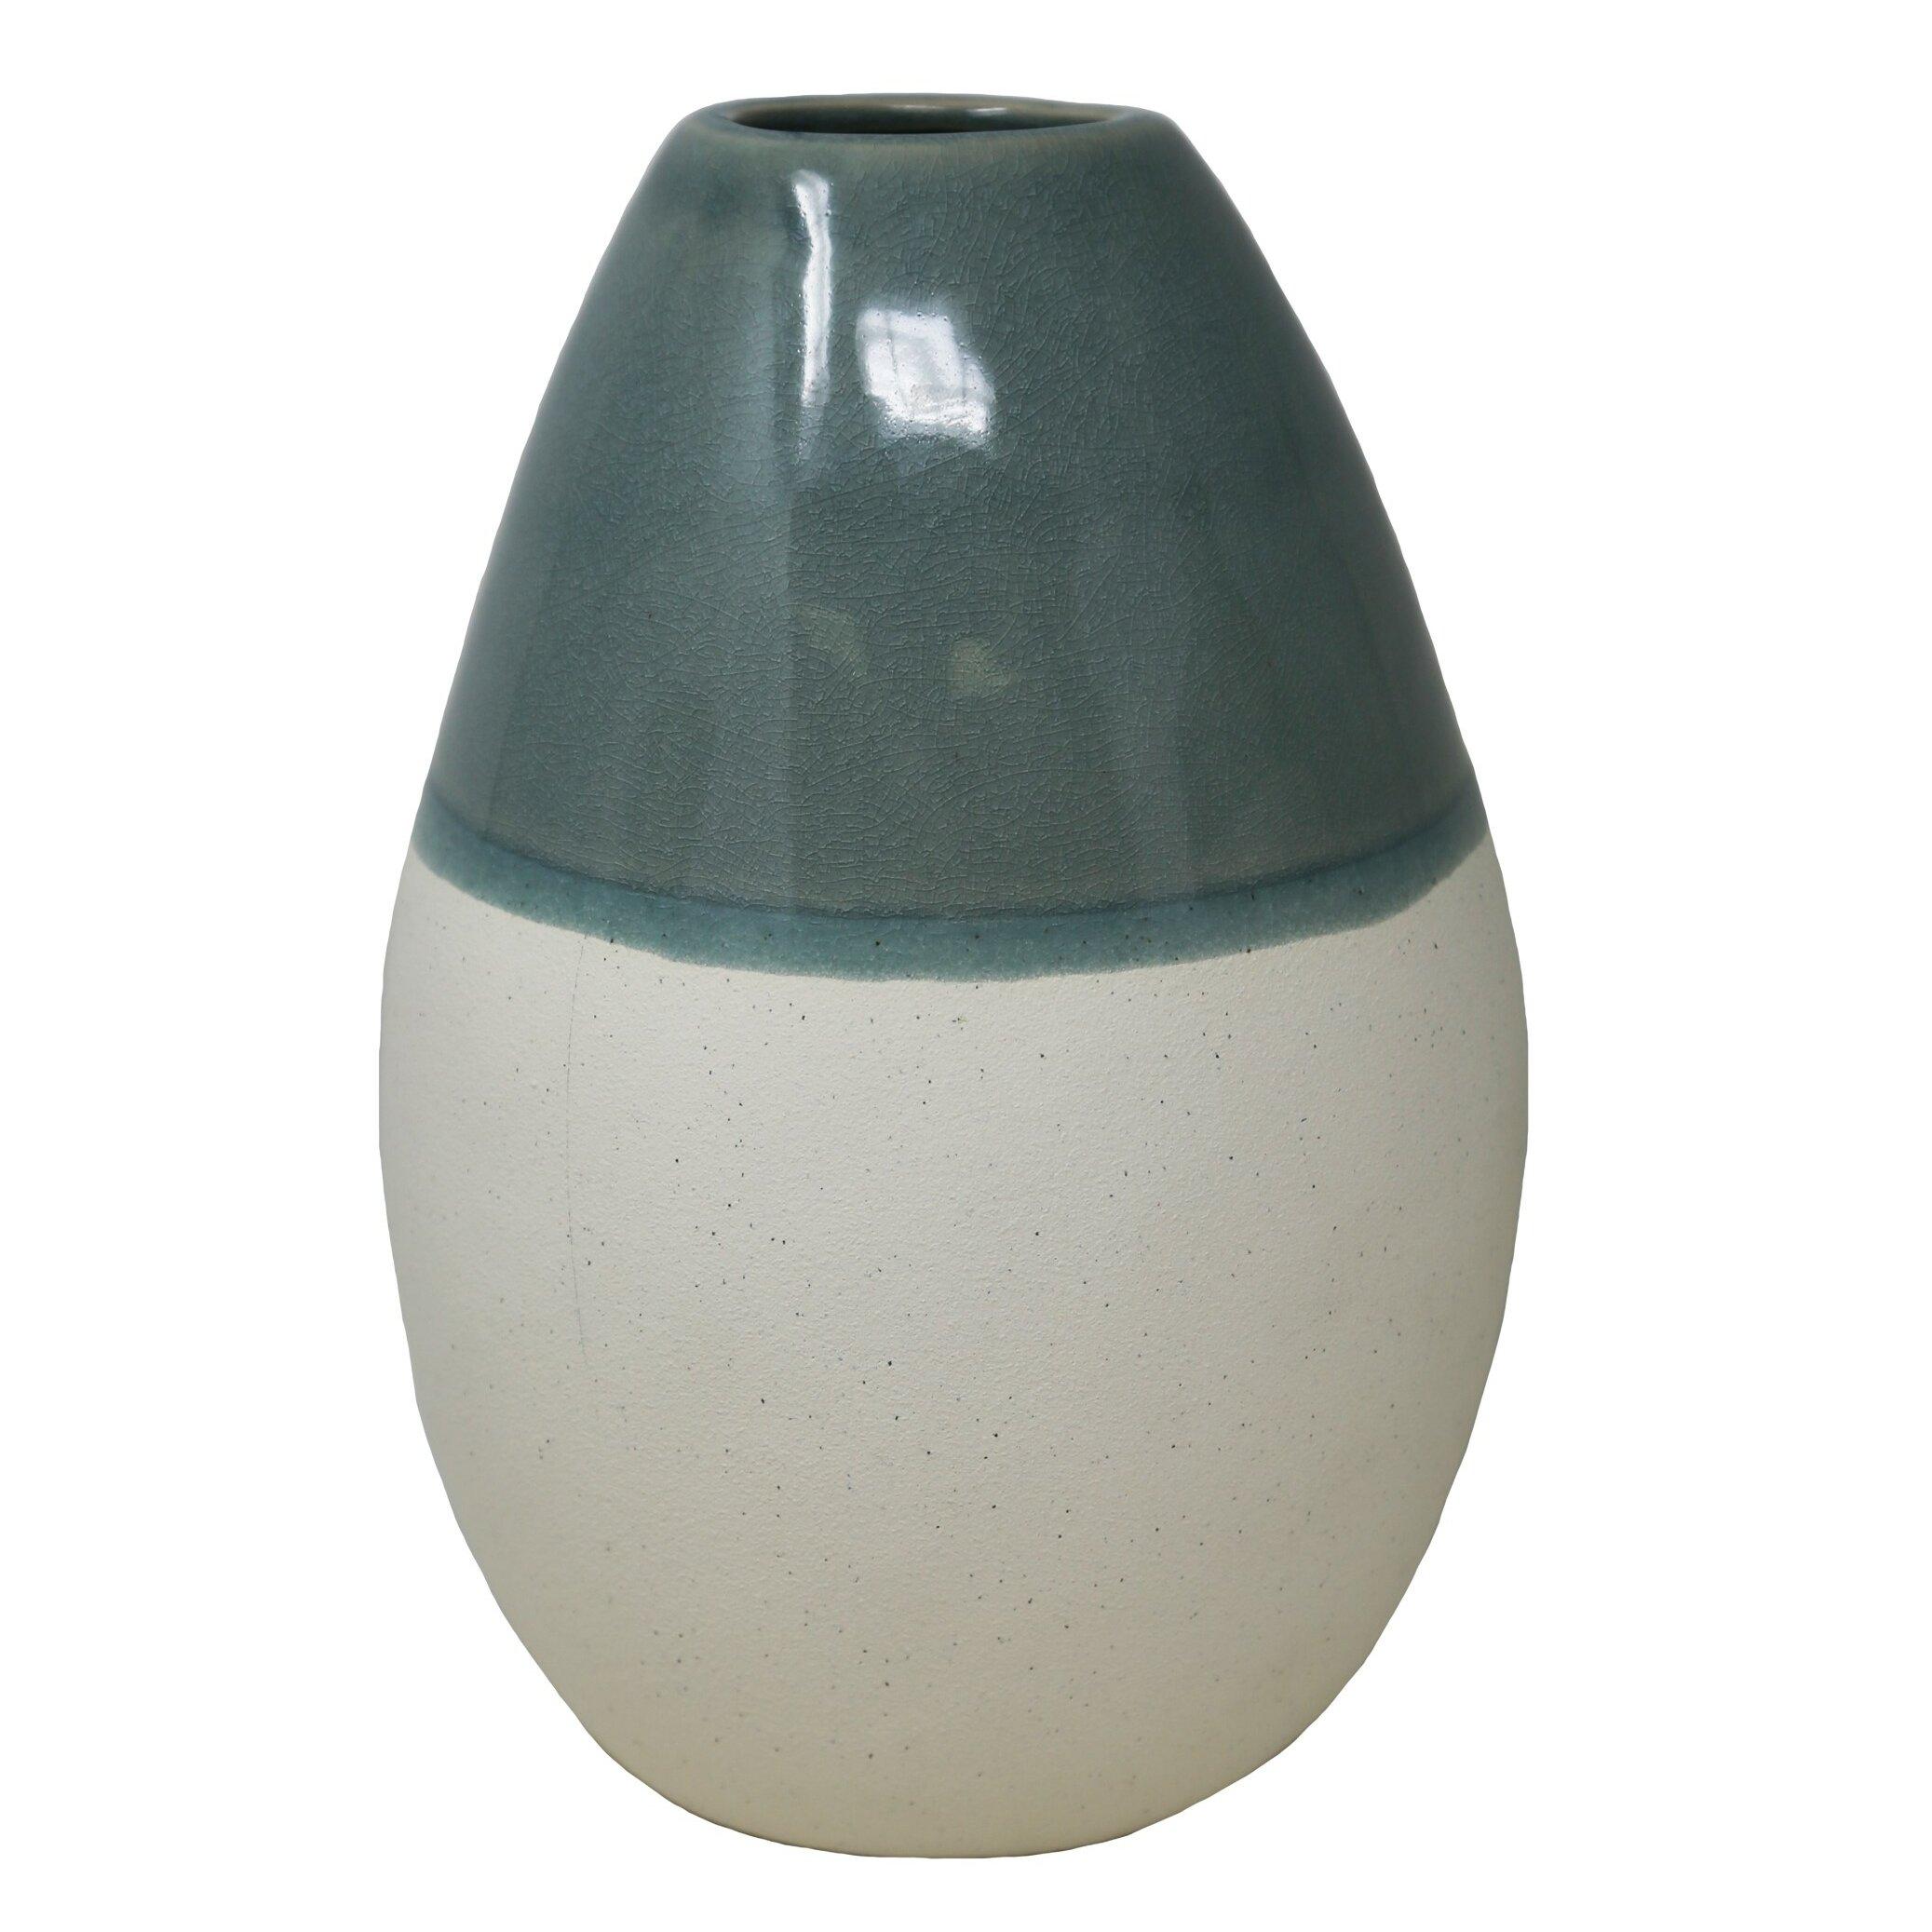 Highland Dunes Delafuente Ceramic Glazed Texture Table Vase Wayfair